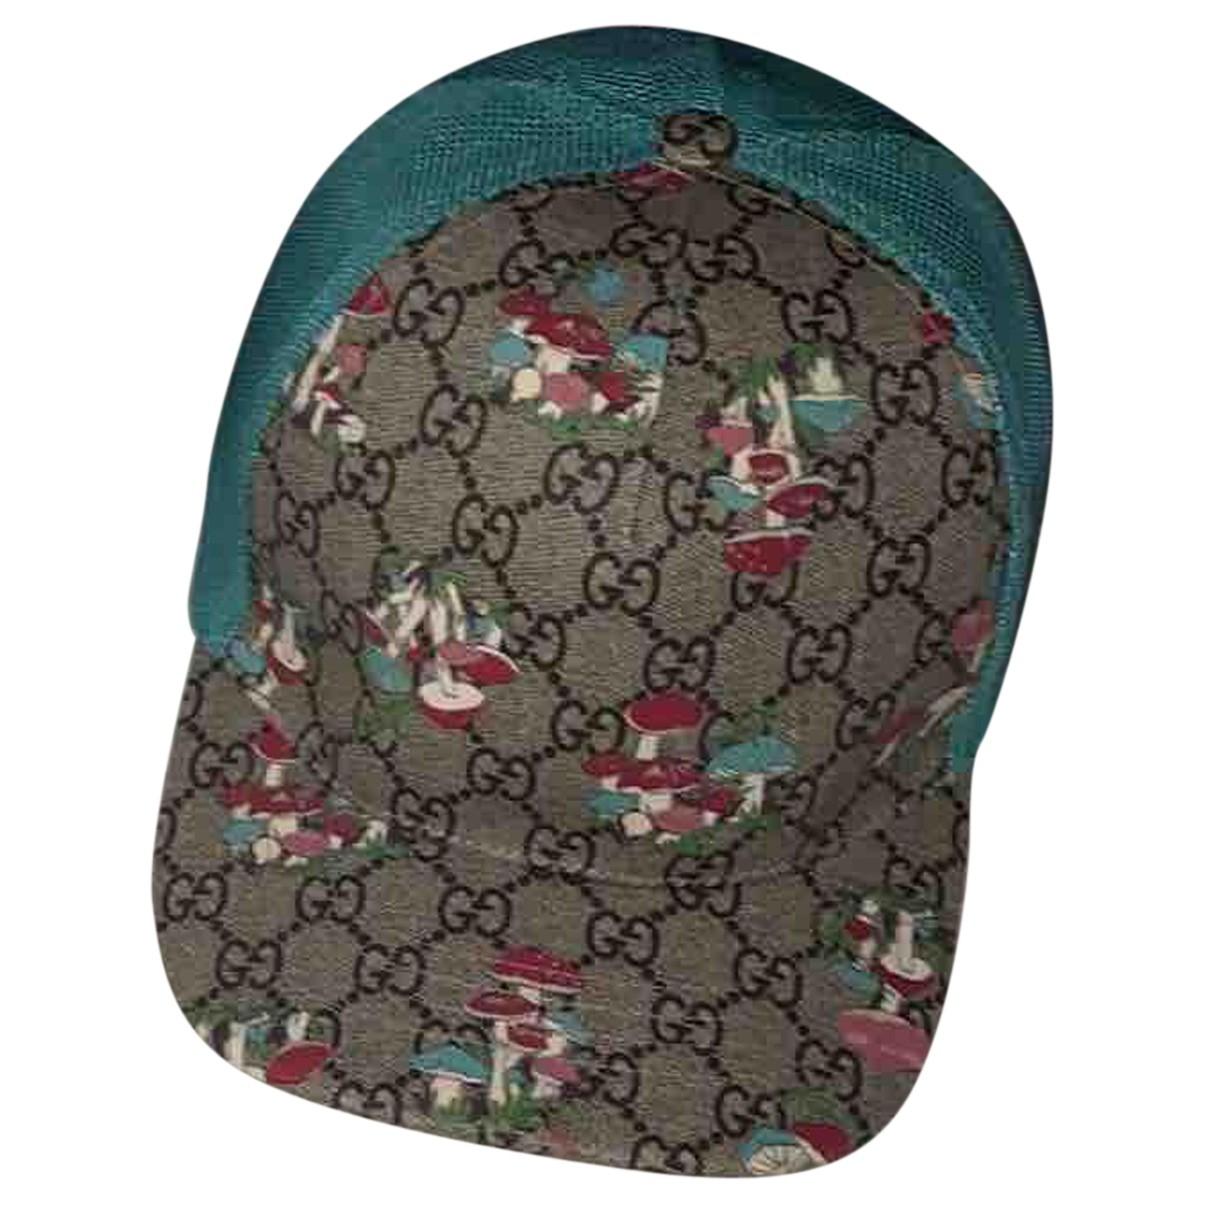 Gucci N Beige Cloth hat & pull on hat for Men 56 cm